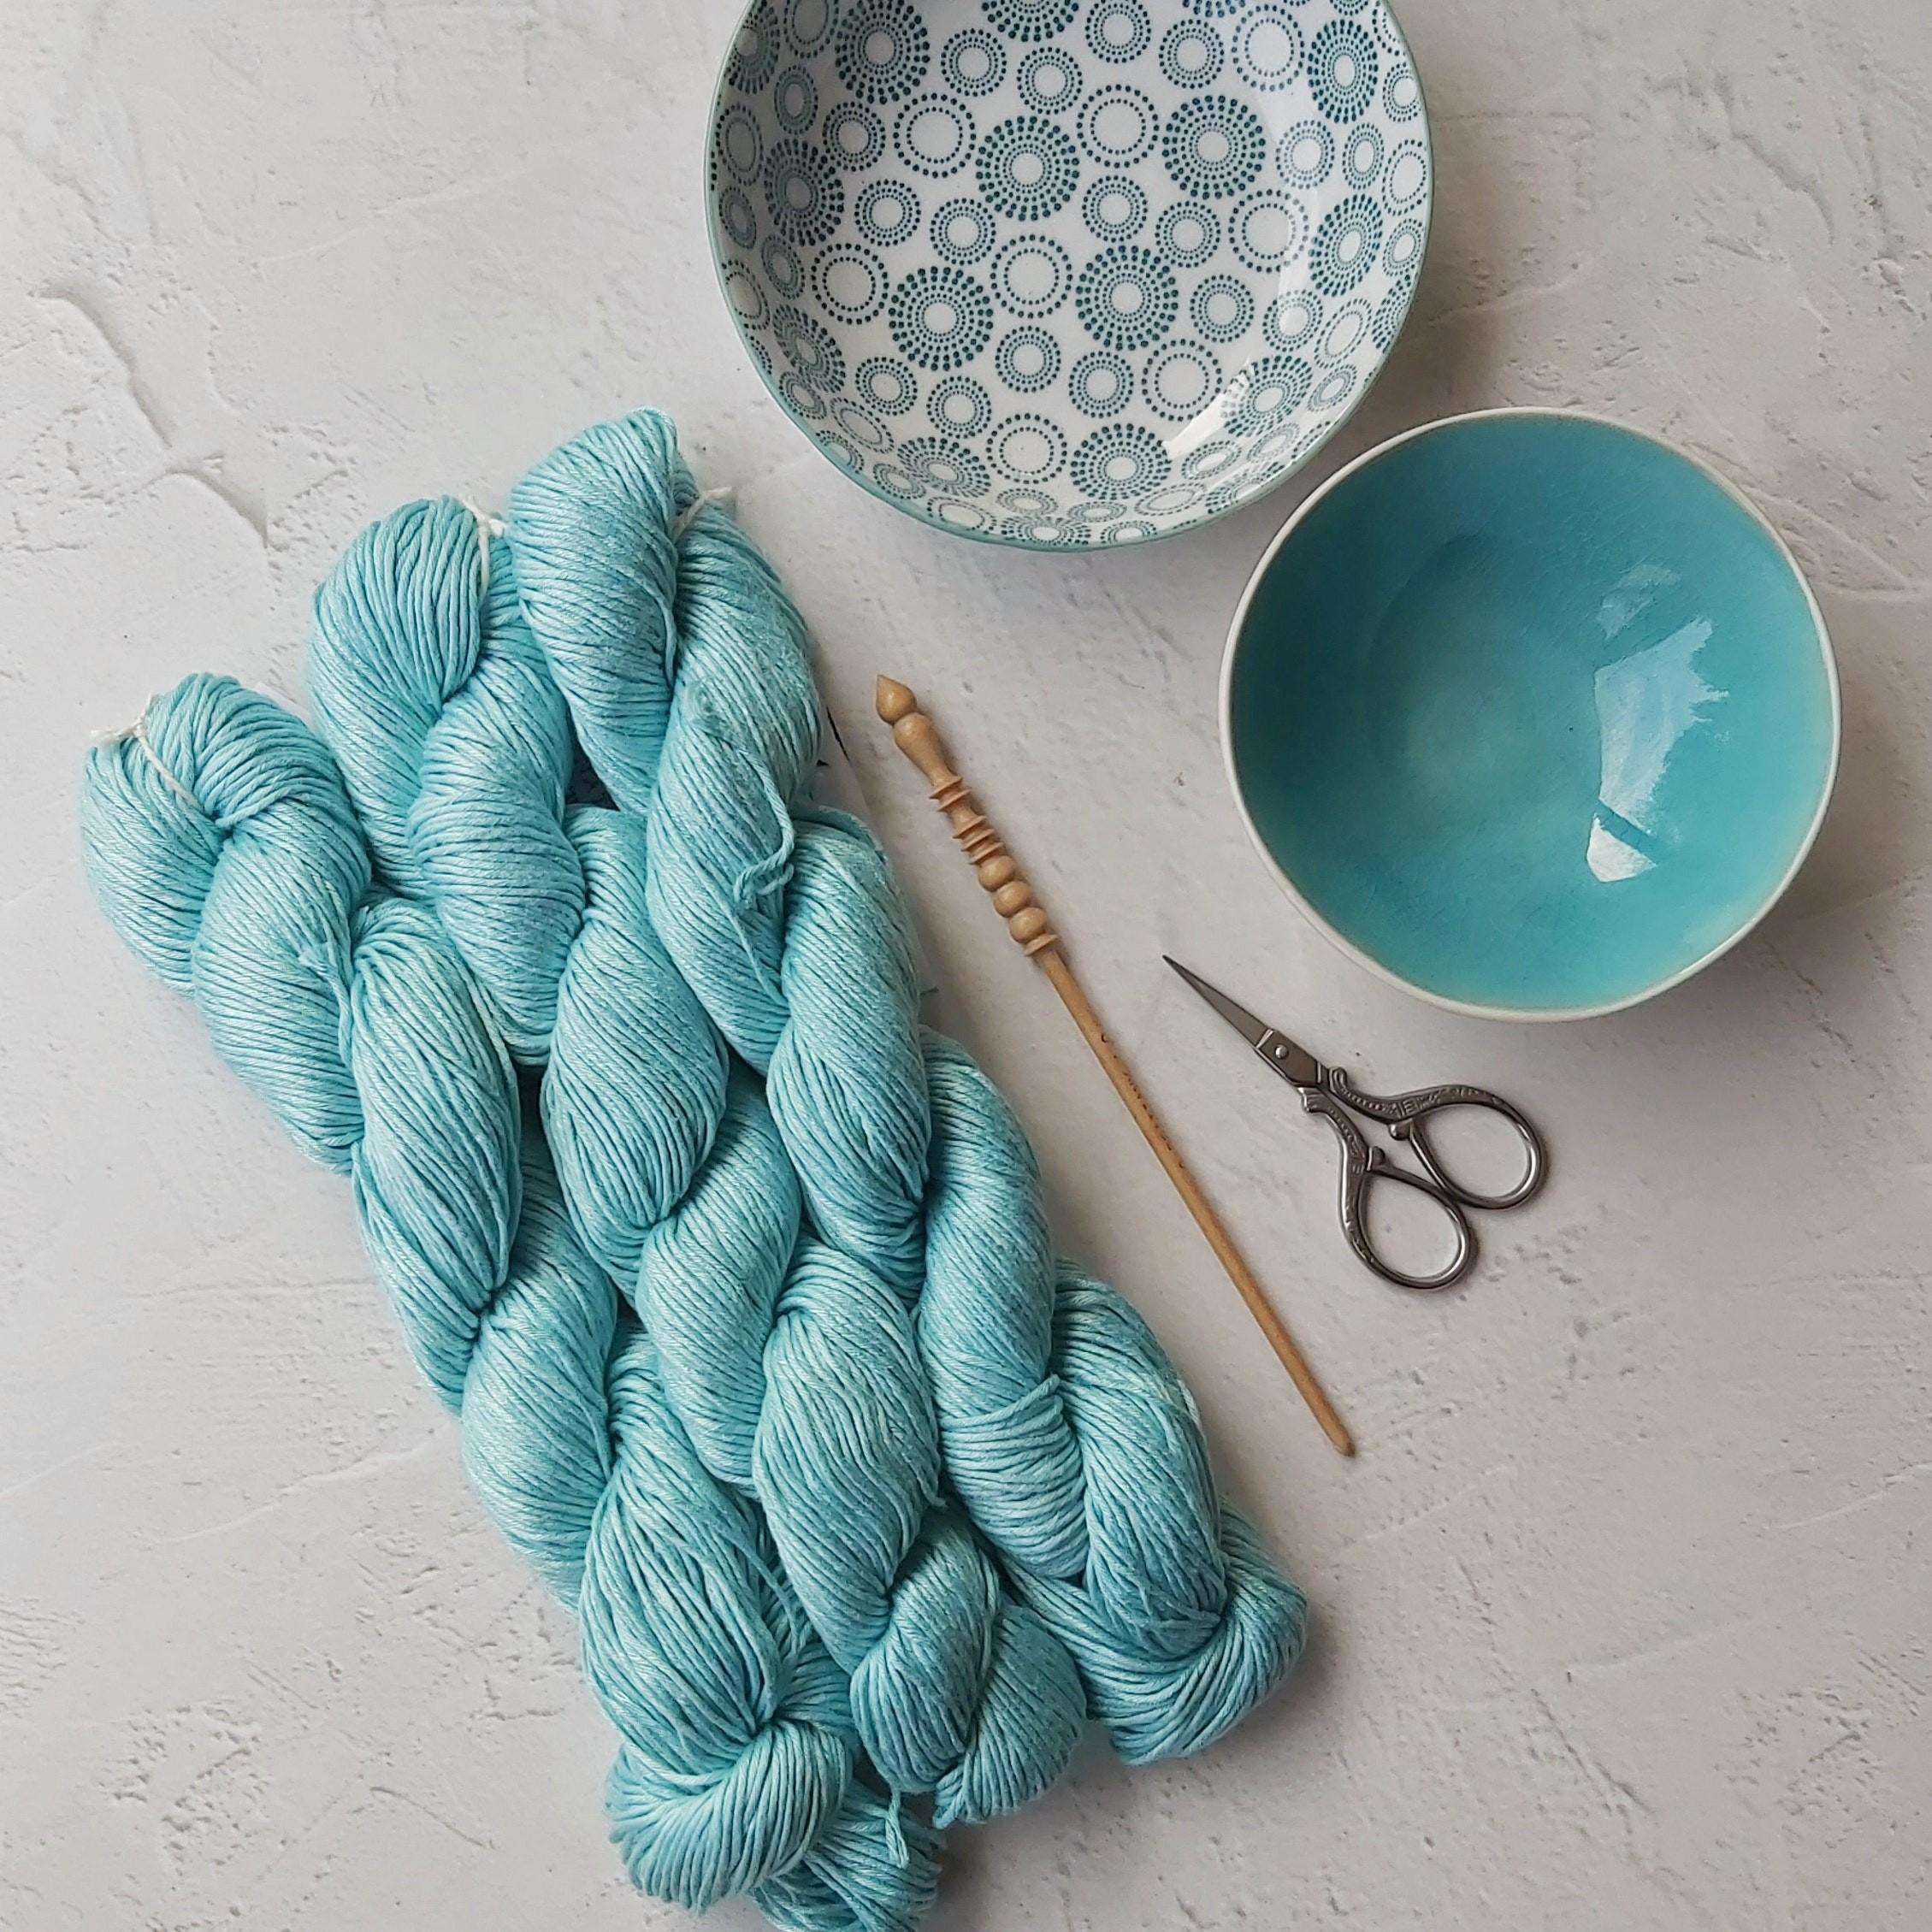 Blue yarn and needle